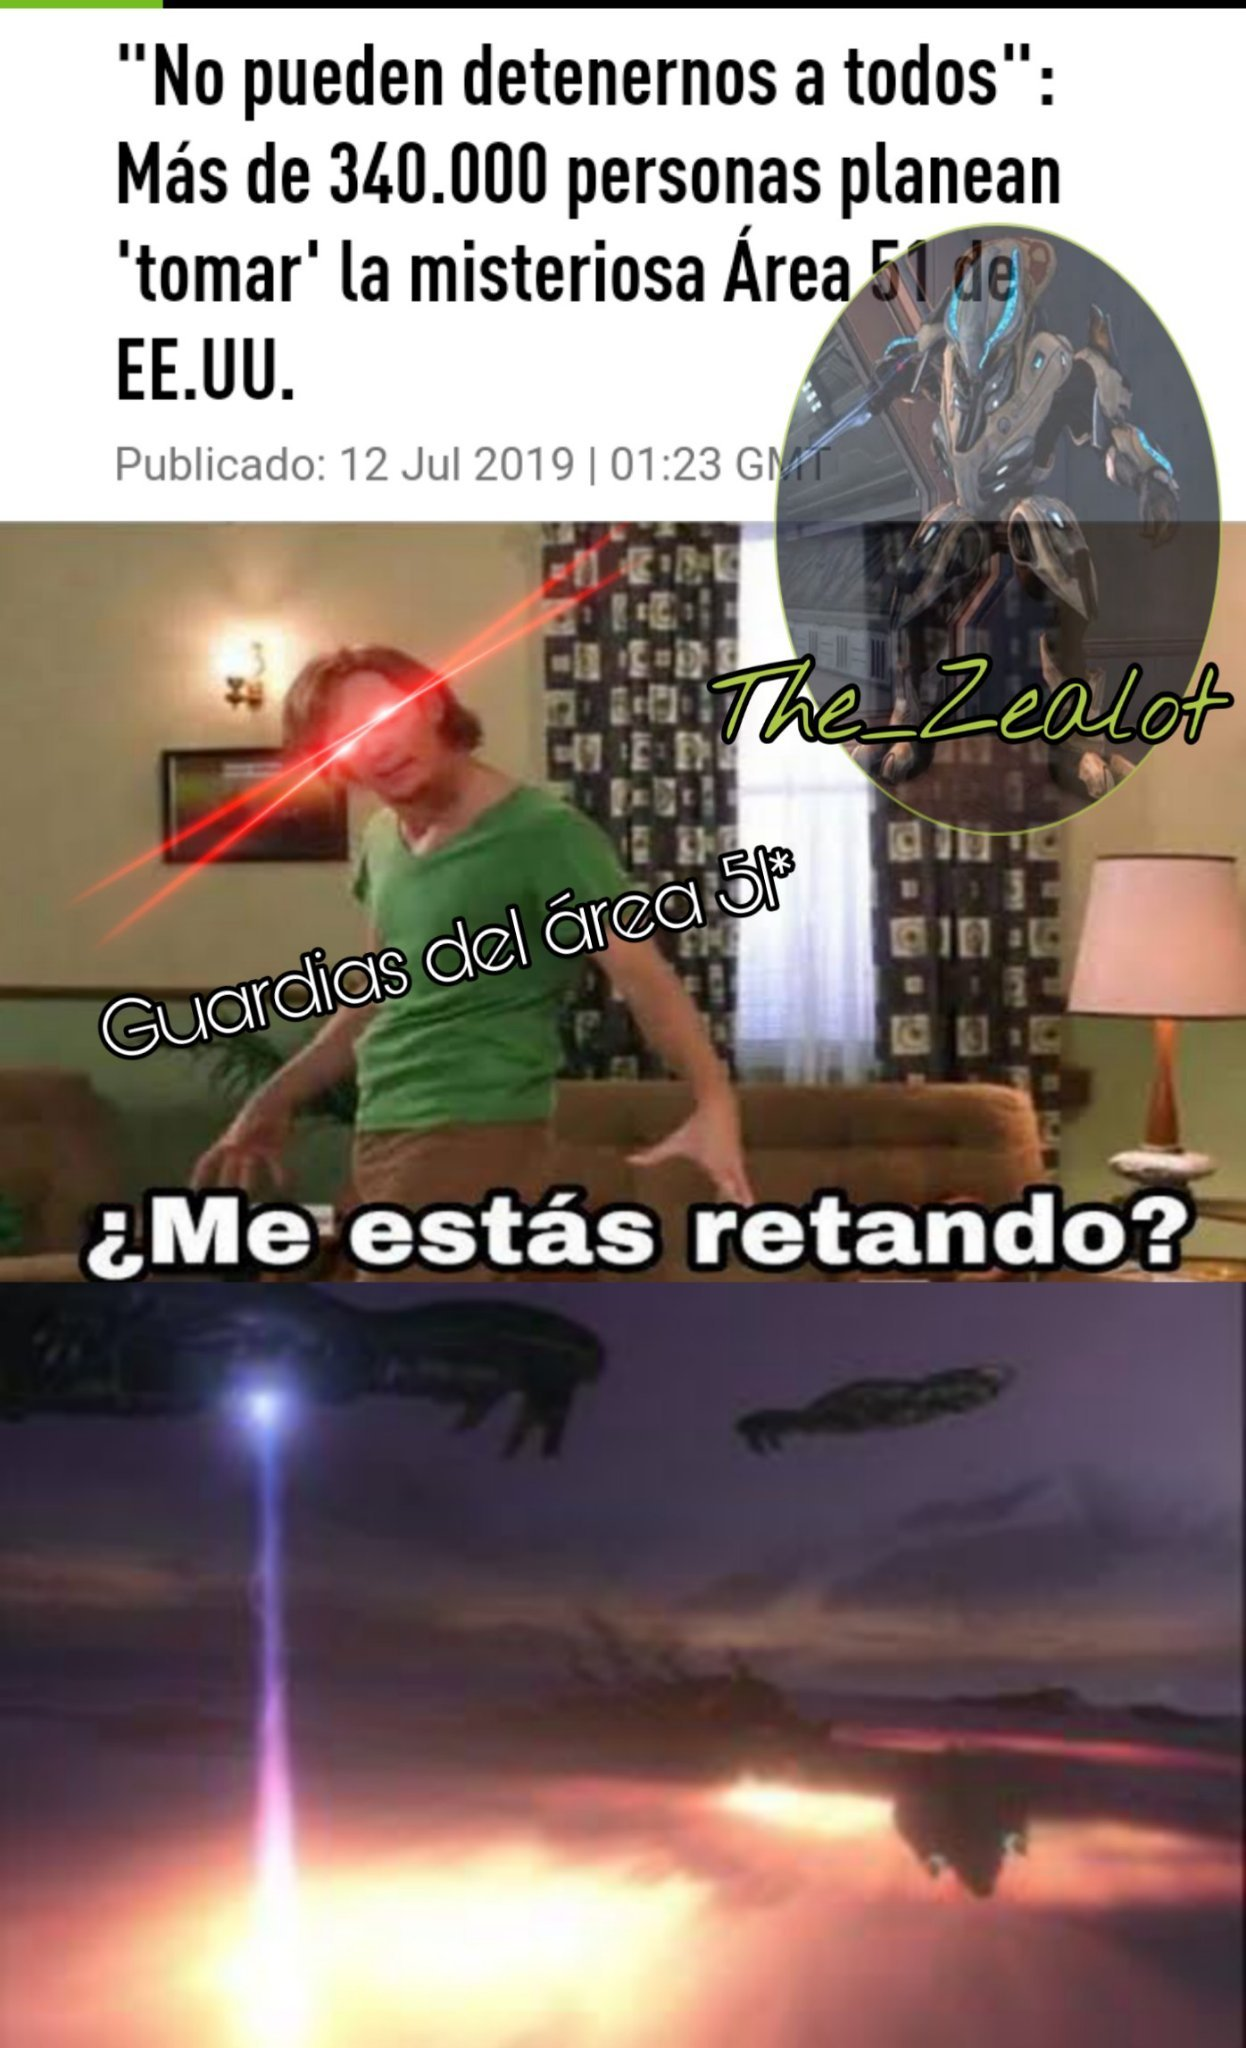 Área 51 - meme